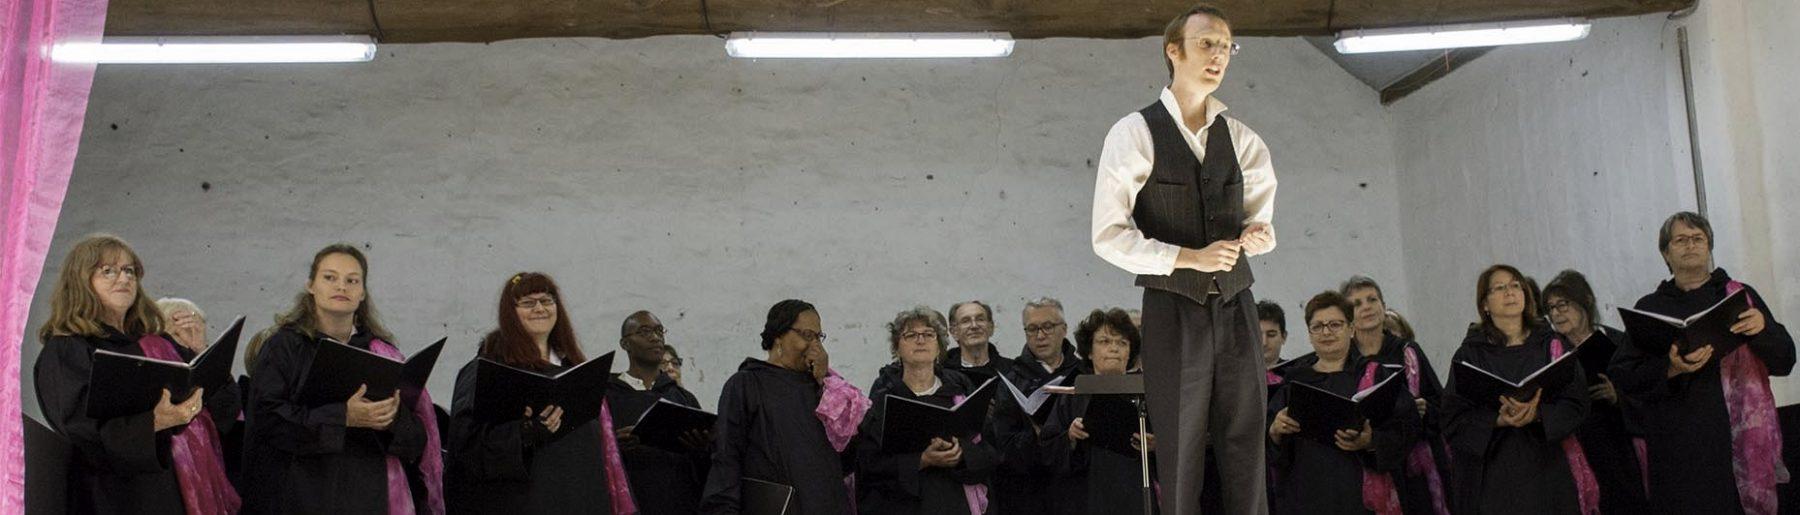 Ensemble Vocal Romantica